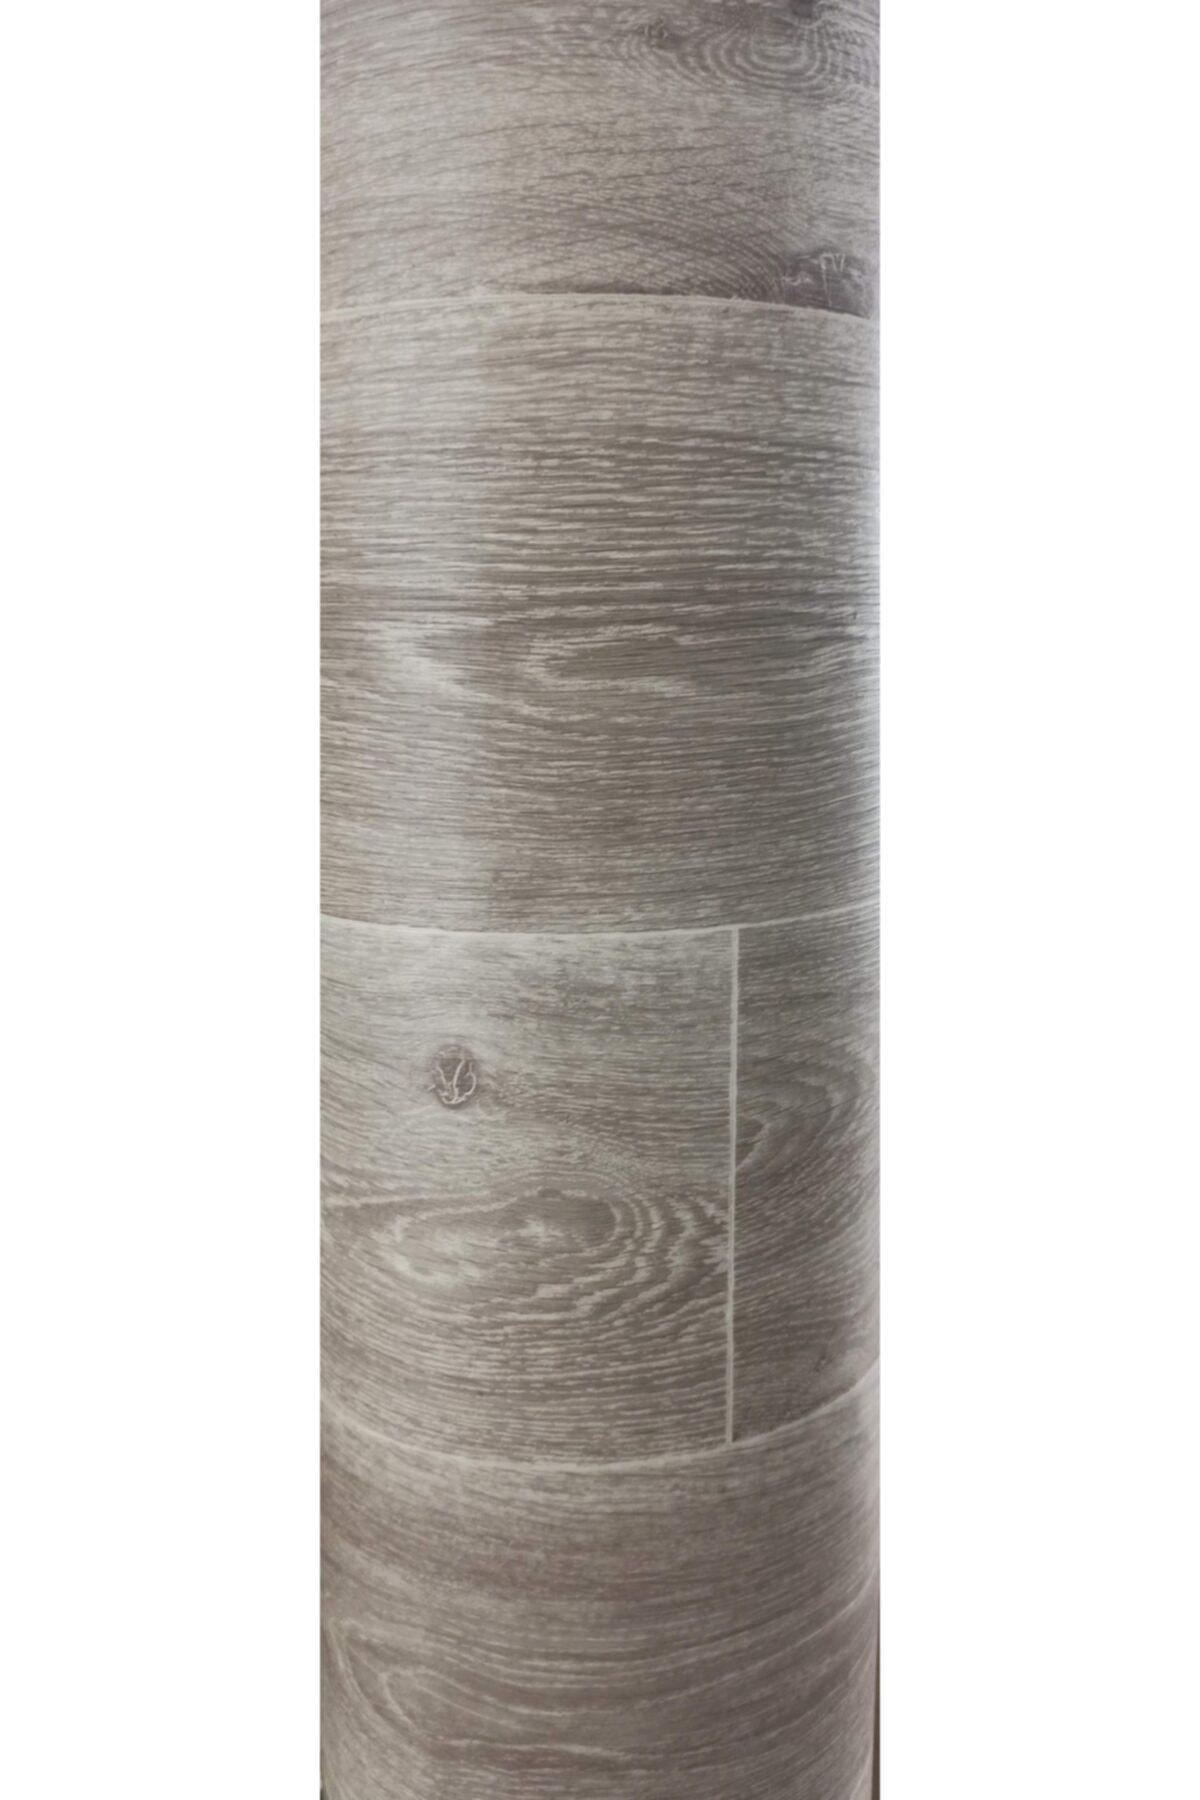 Pvc Yerkaplamasıi, Mineflö, Pvc Zemin Döşeme 2,5mm Kalınlık 100 X 200 Cm (GRİ)